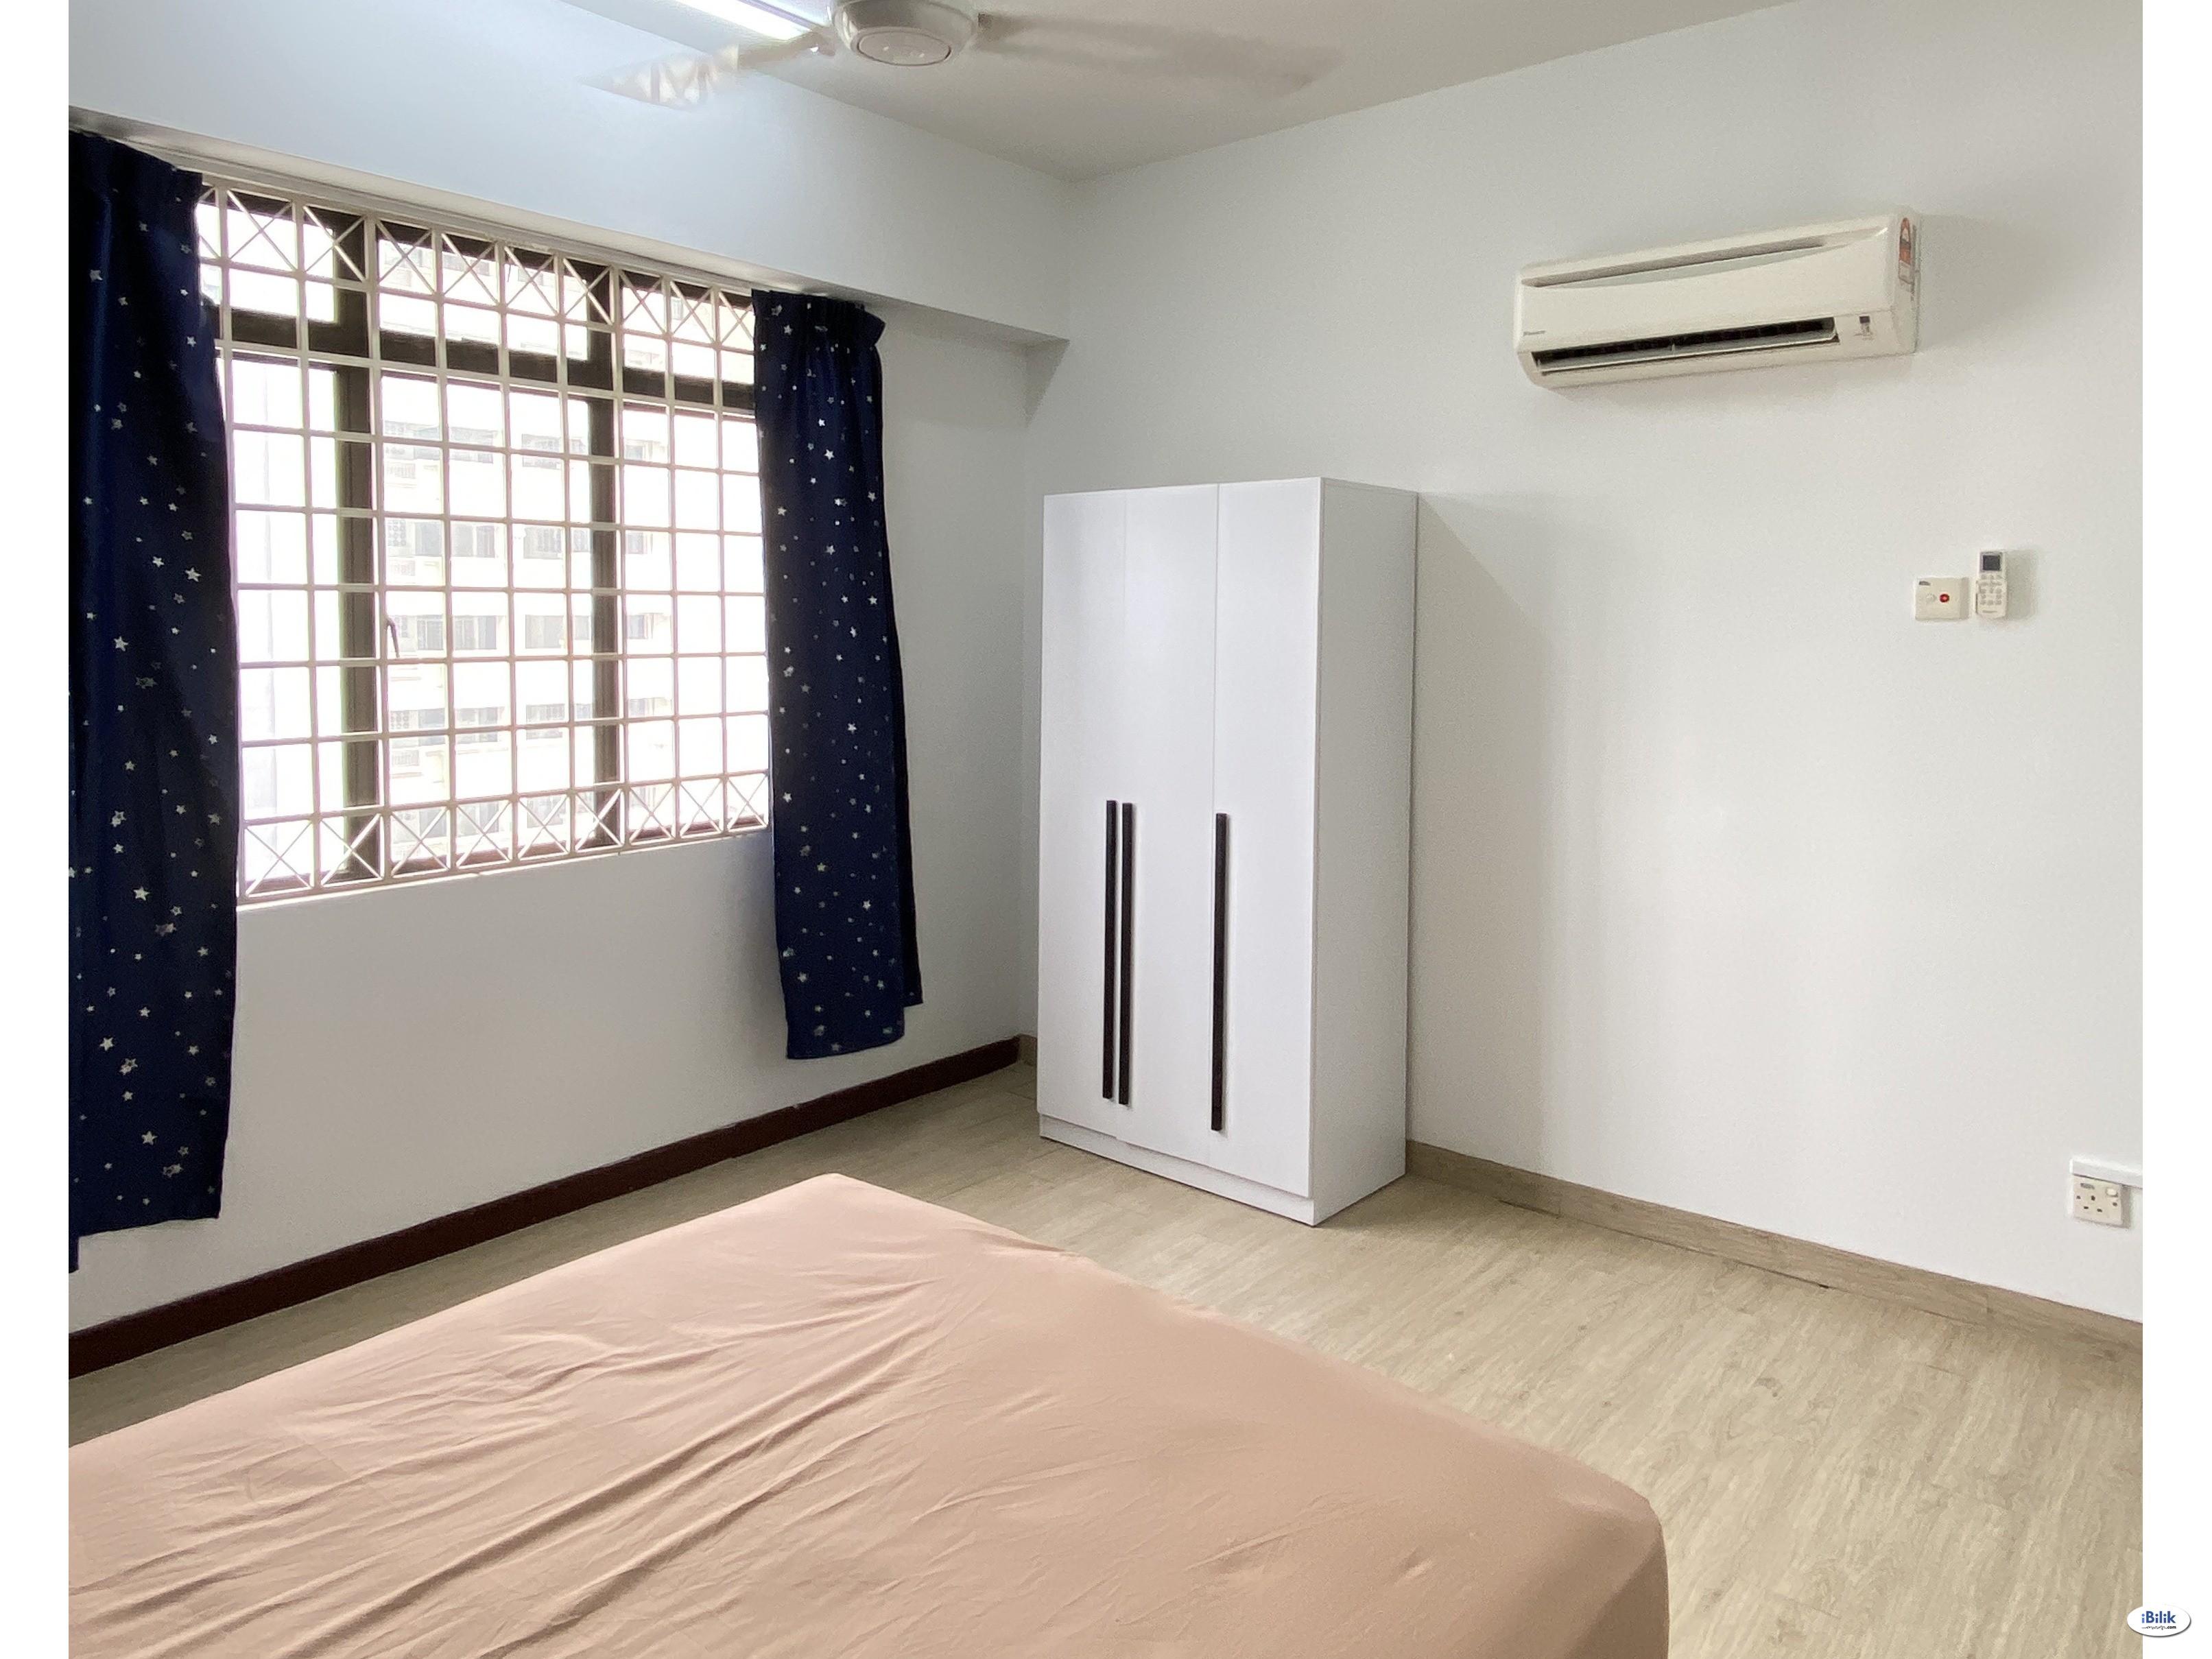 Female Room, Master room with bathroom, Vista B, Near lrt, imu. Wifi and ac all include.